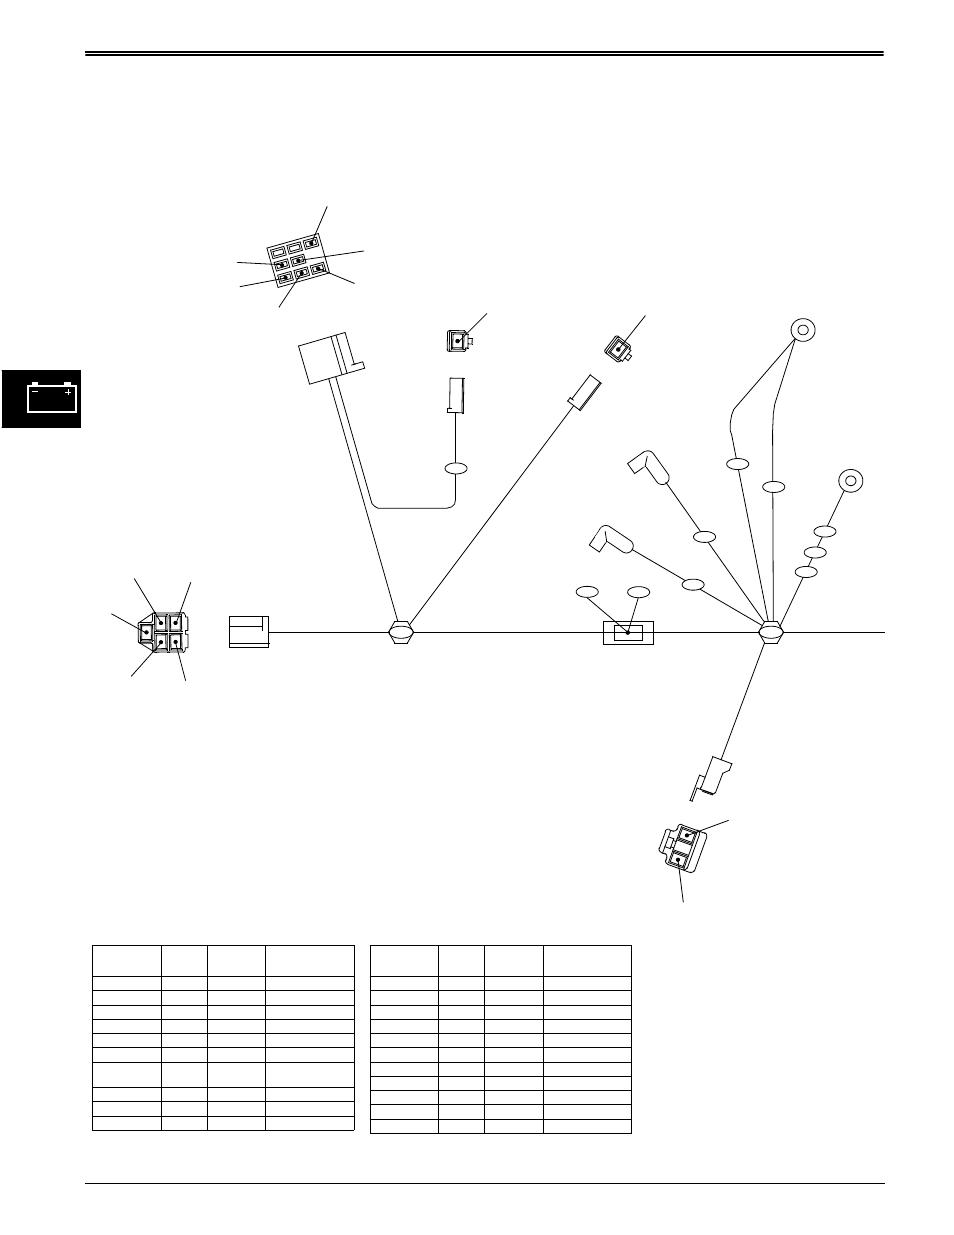 medium resolution of wiring harness diagrams electrical john deere stx38 user manual rh manualsdir com john deere l130 wiring